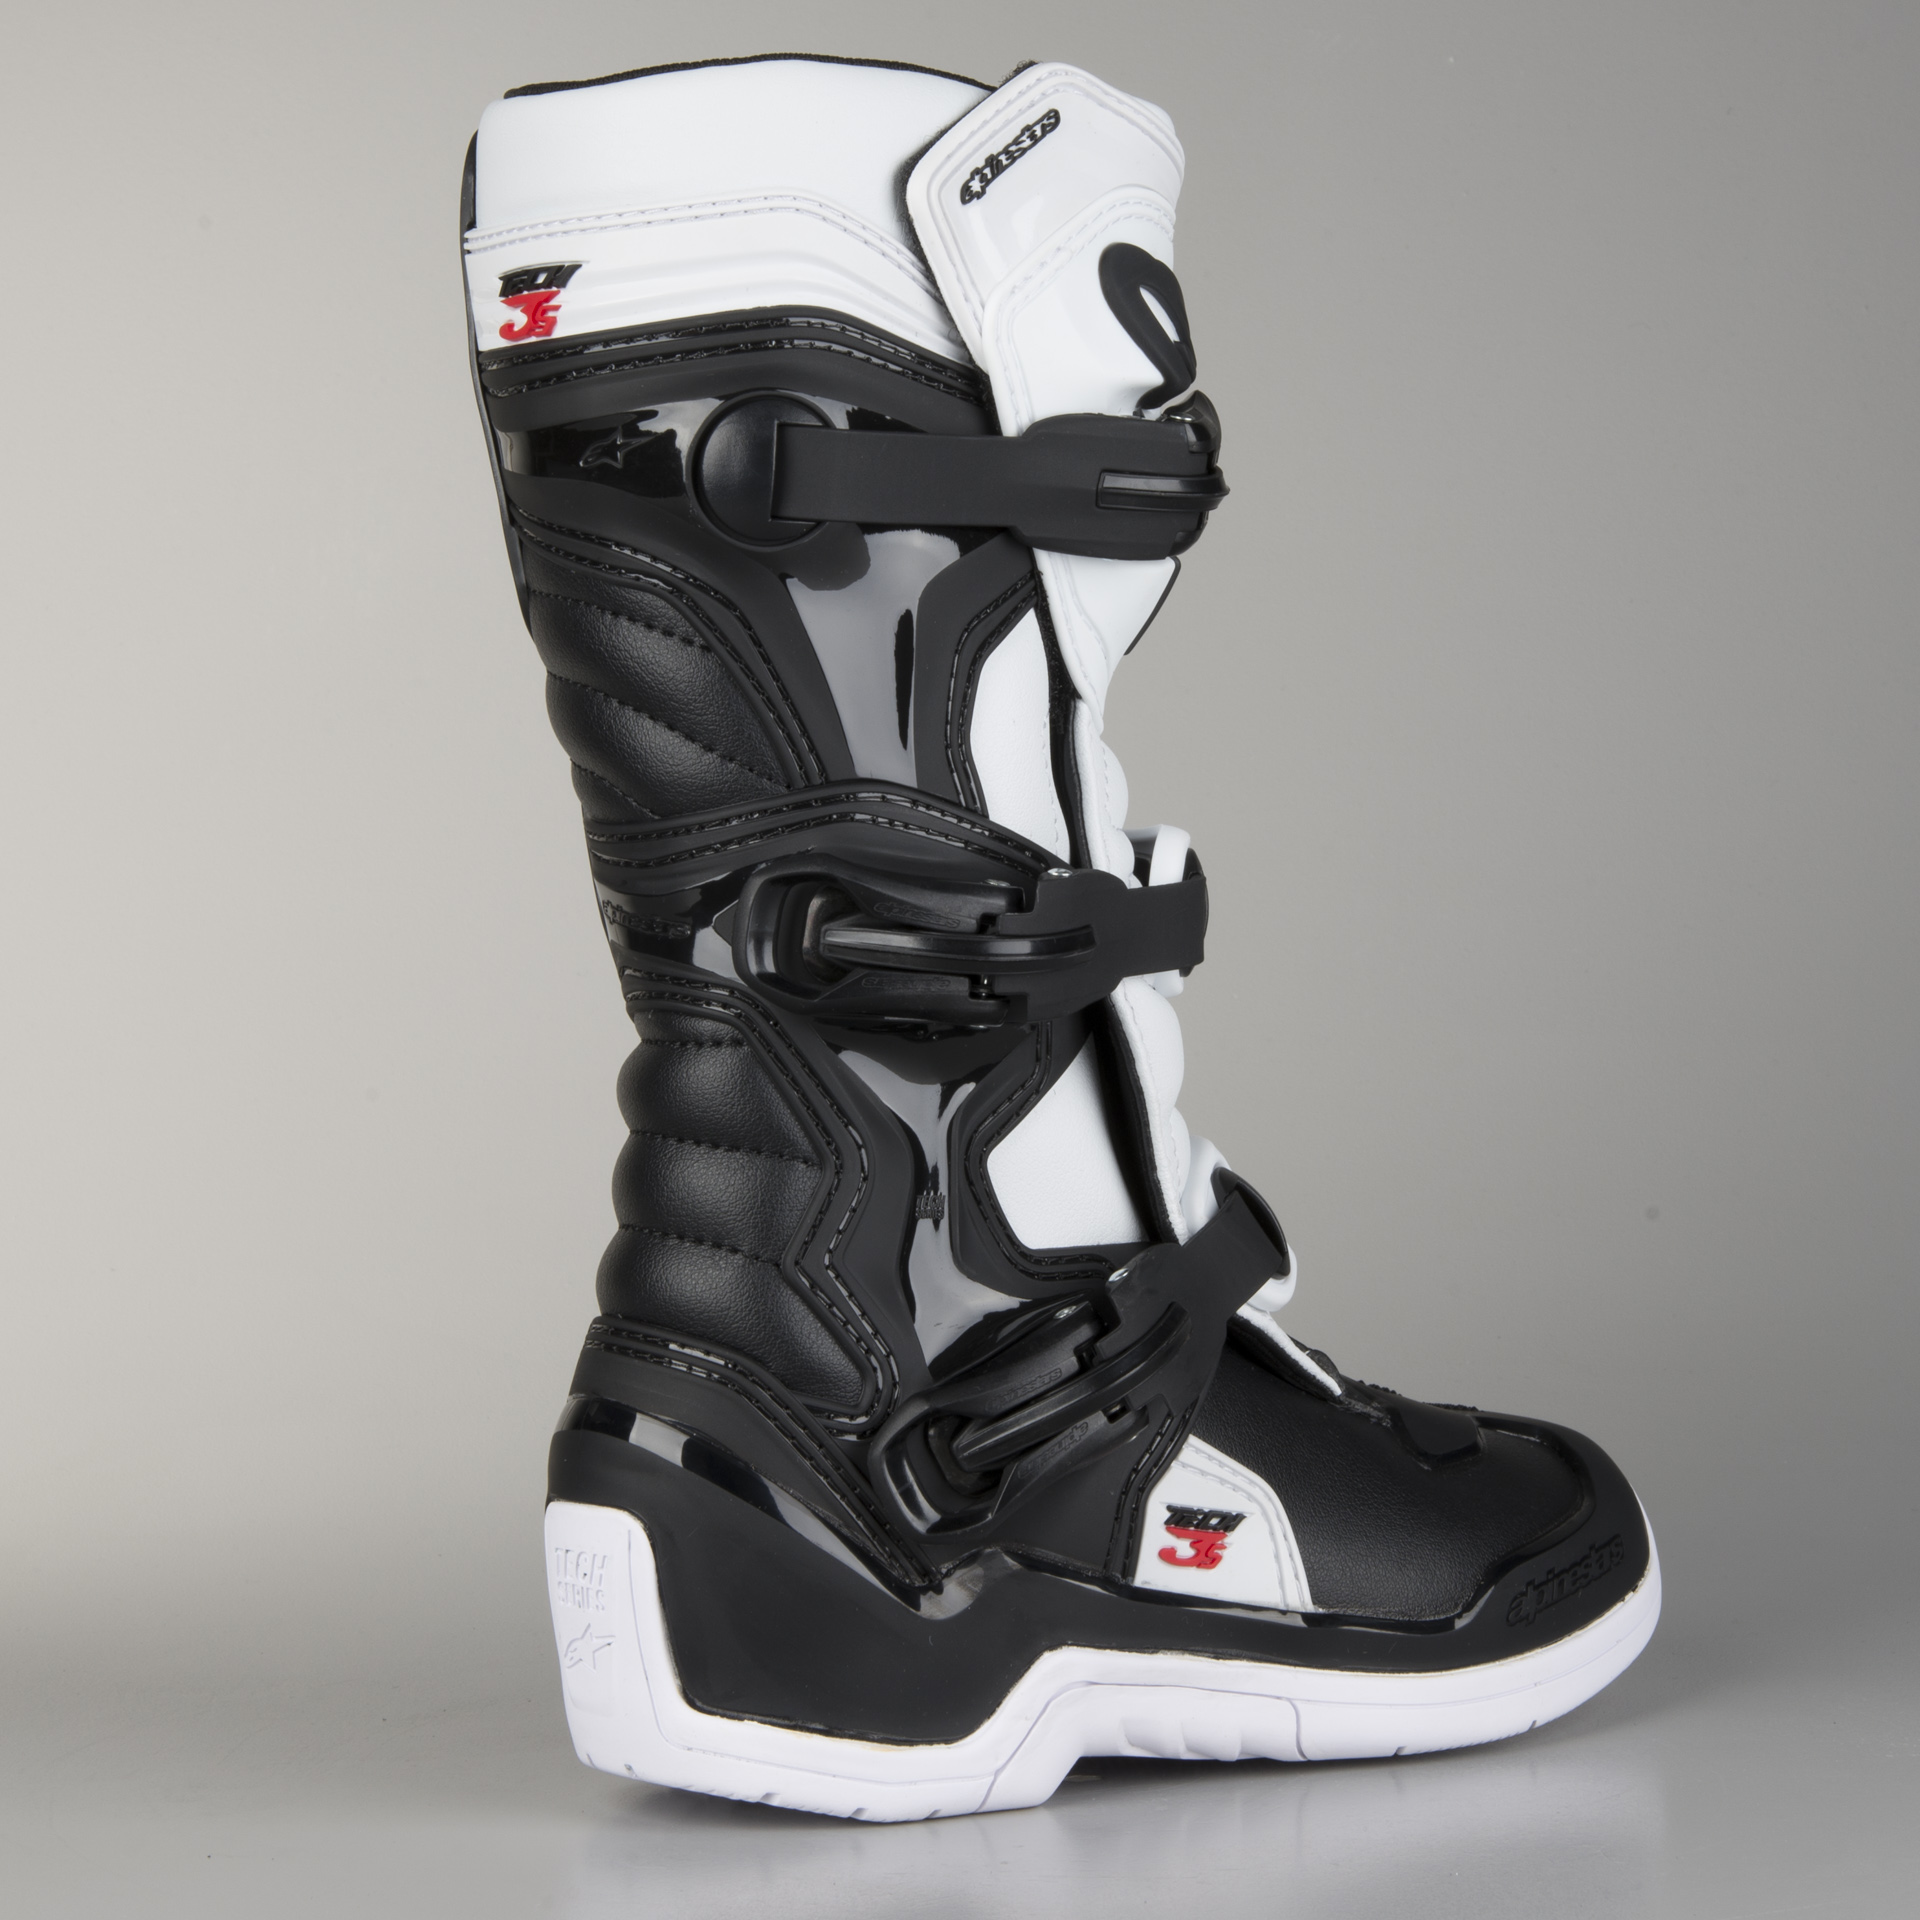 Alpinestars Youth Tech 3 Boots Black White